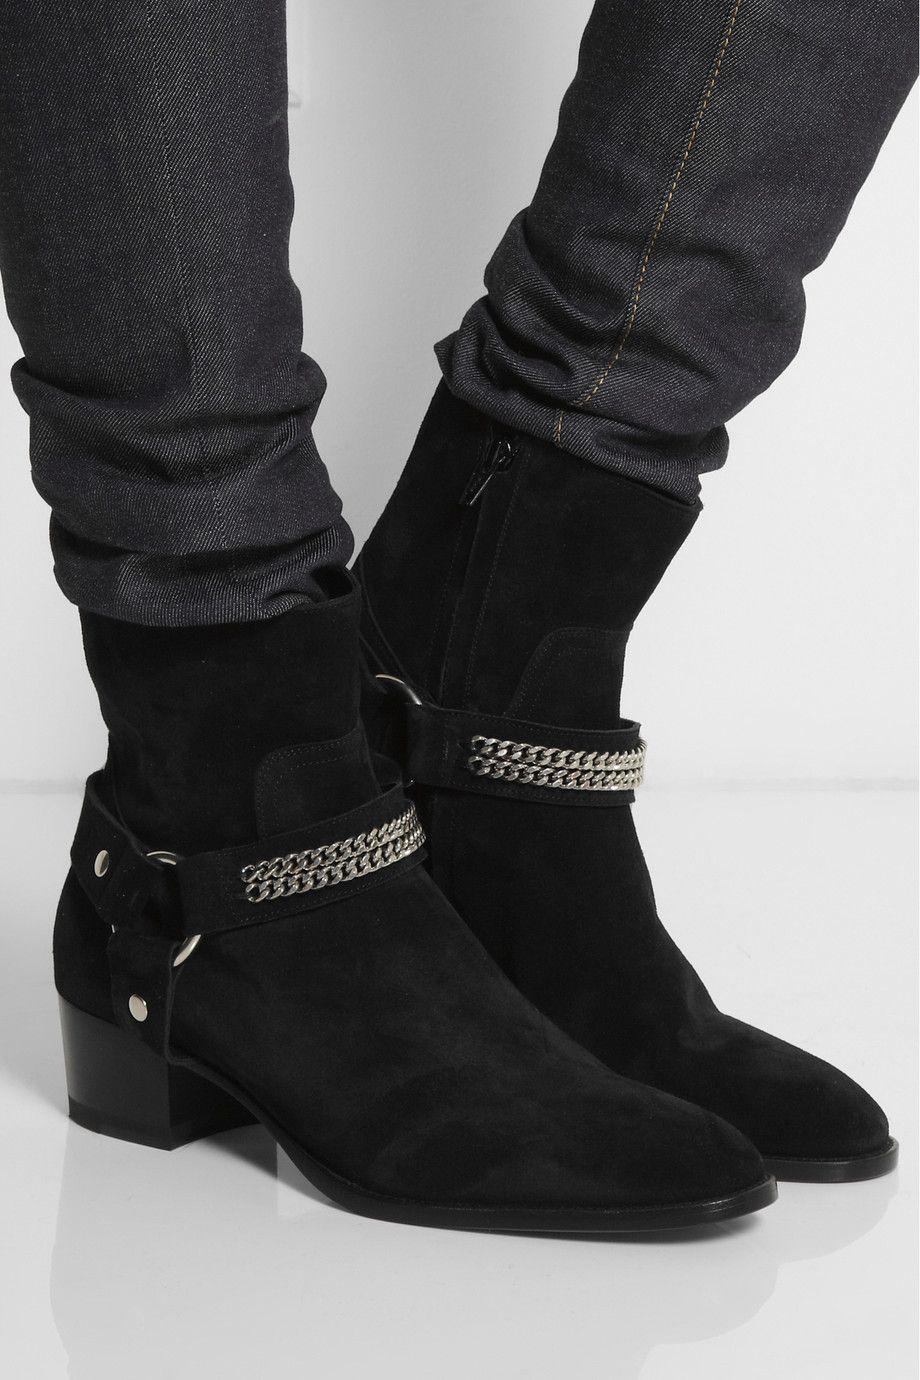 Saint Laurent  Chaintrimmed suede ankle boots